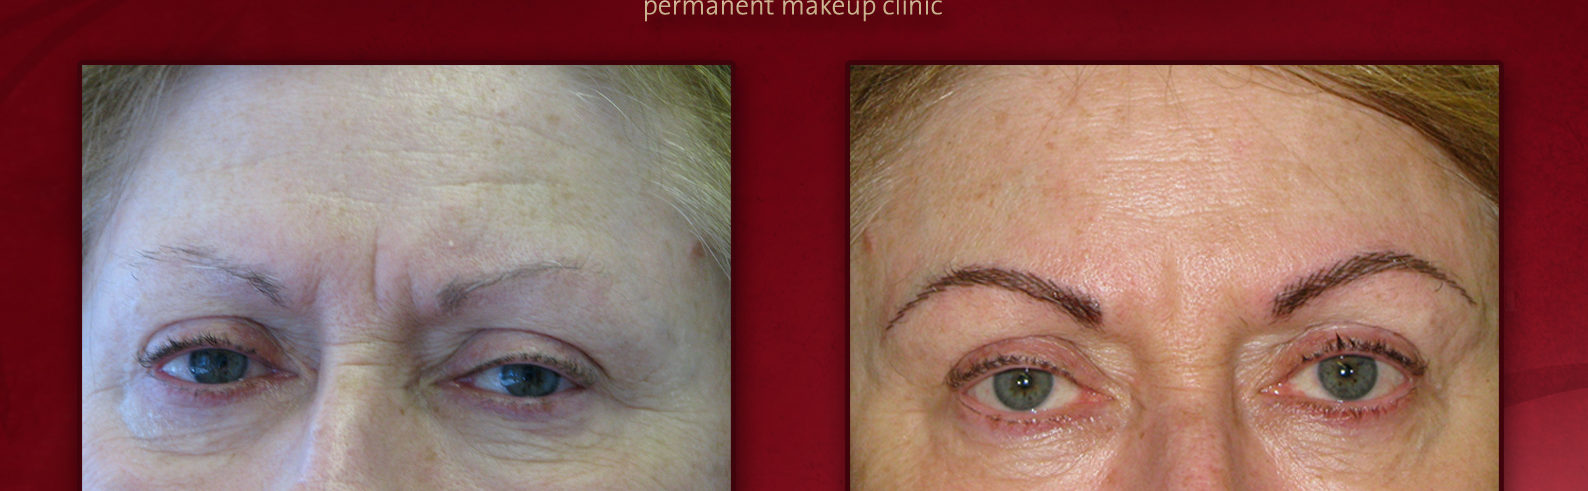 Dallas Fort Worth Mpi Permanent Makeup Microblading Clinic